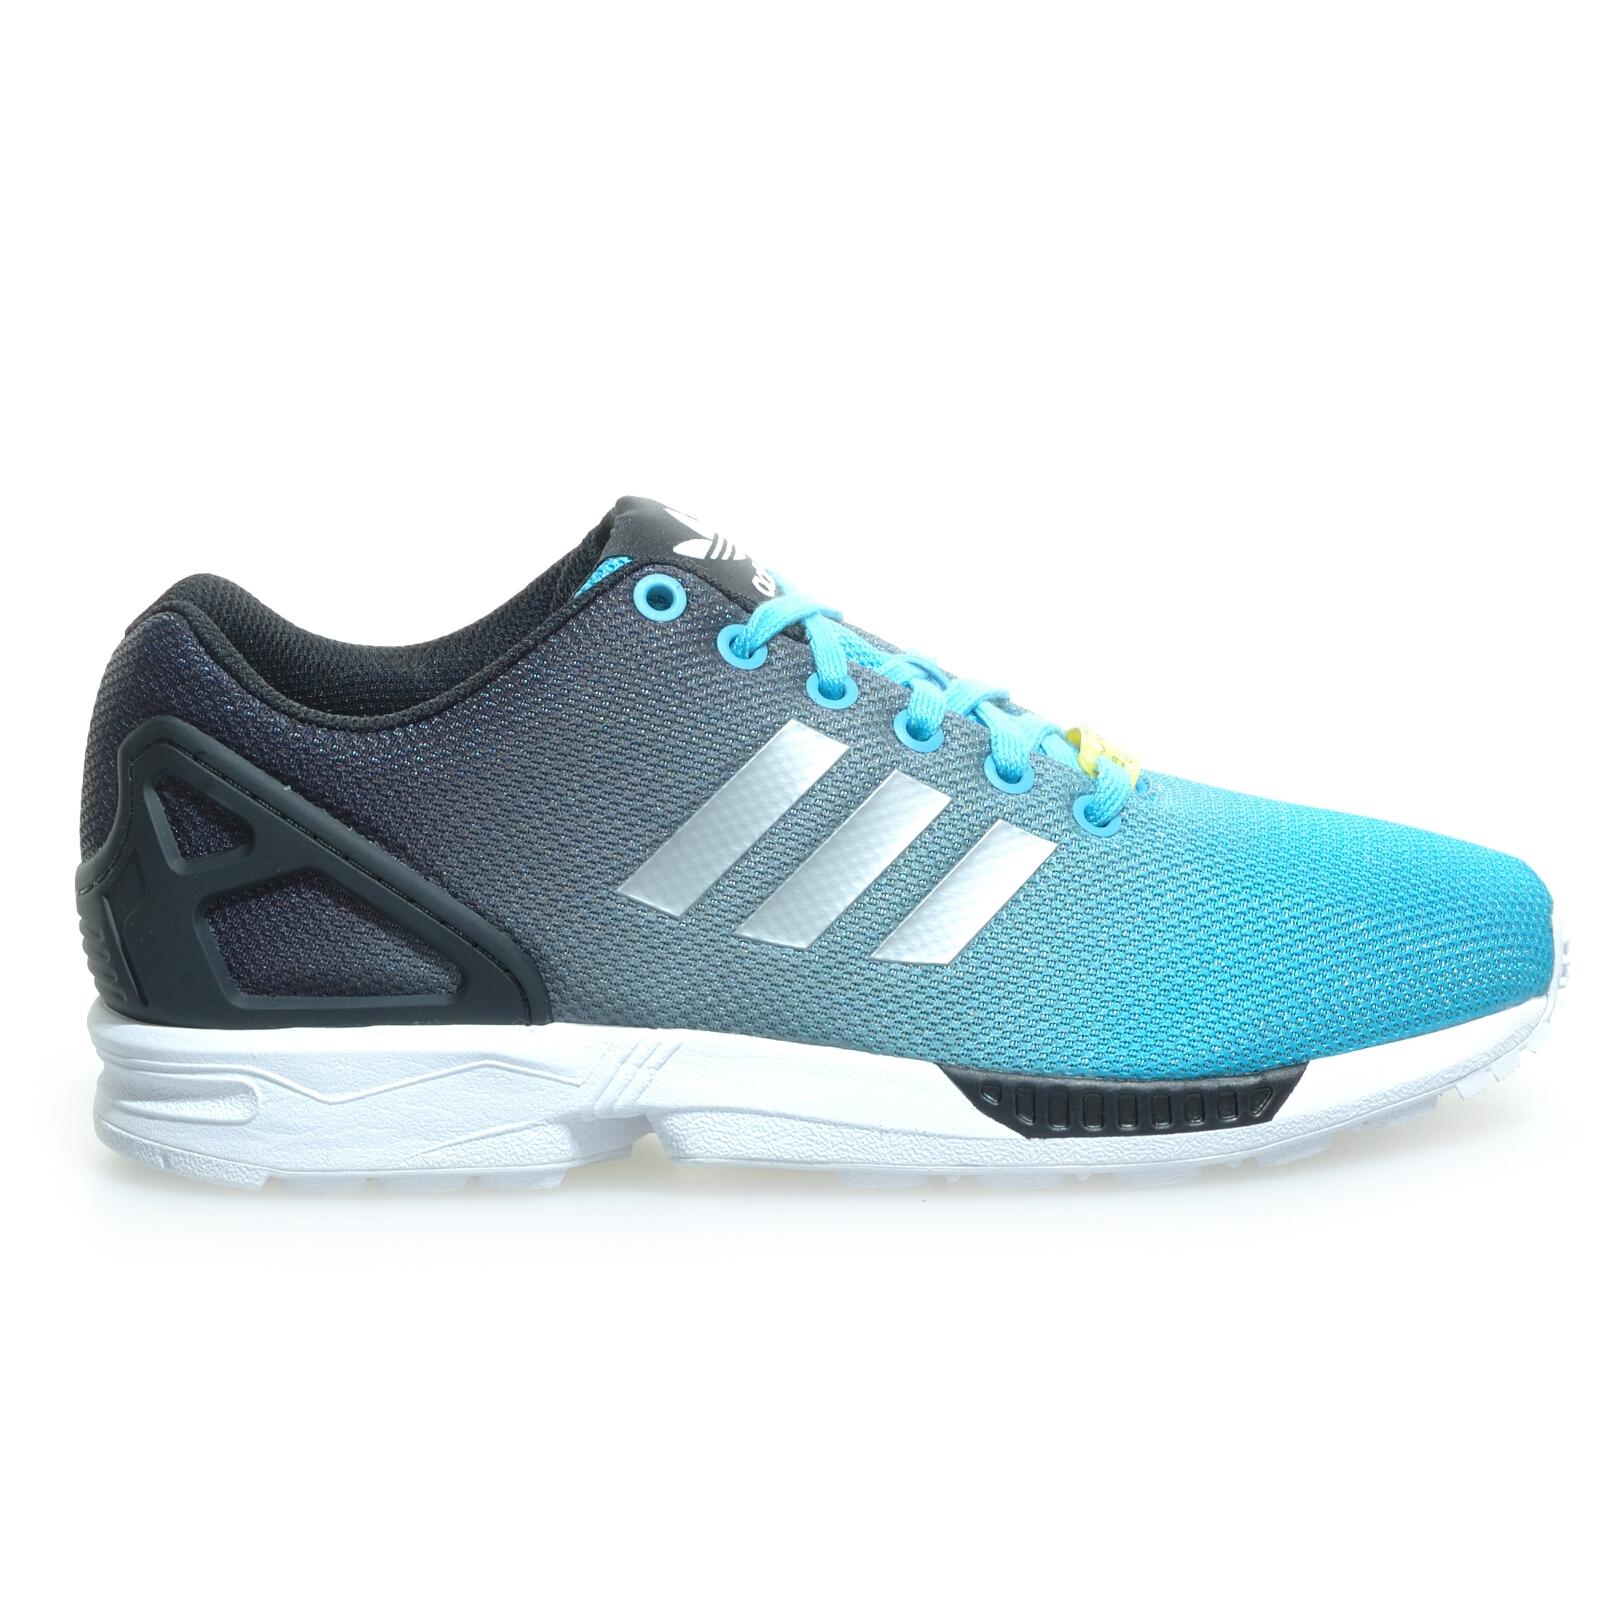 adidas zx flux herren blau